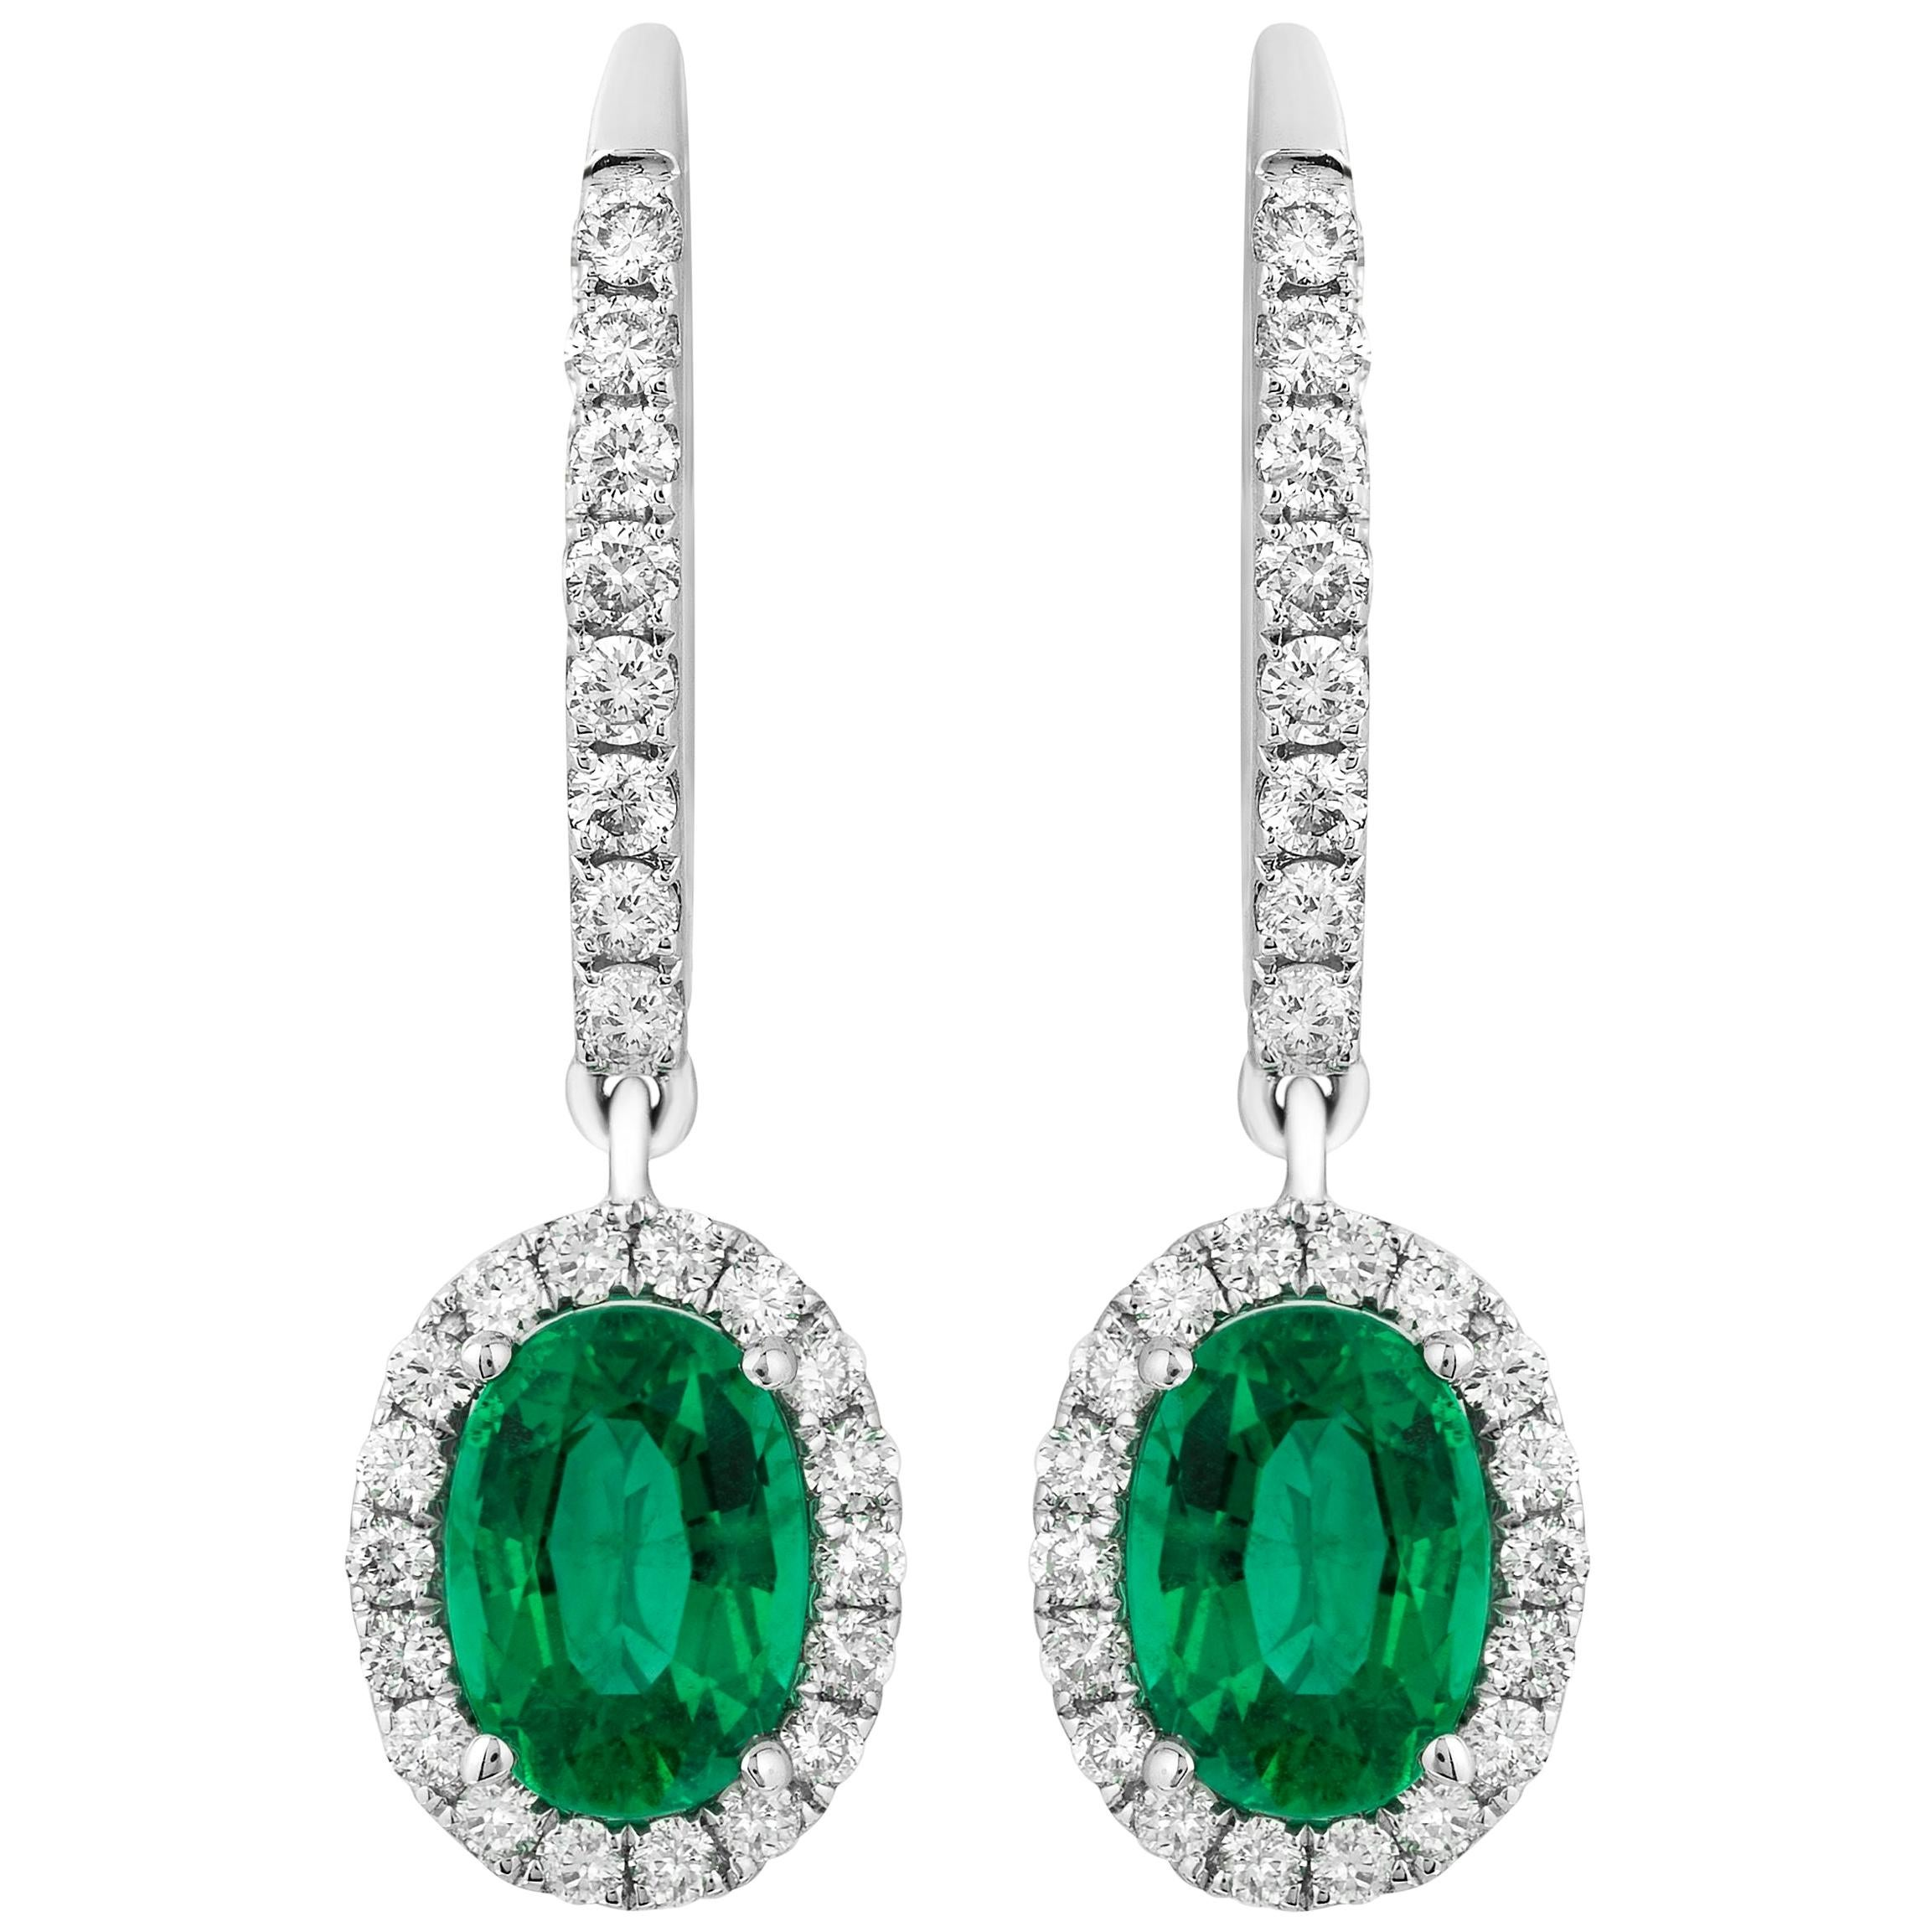 1.50 Carat Emerald Diamond Dangle Earrings